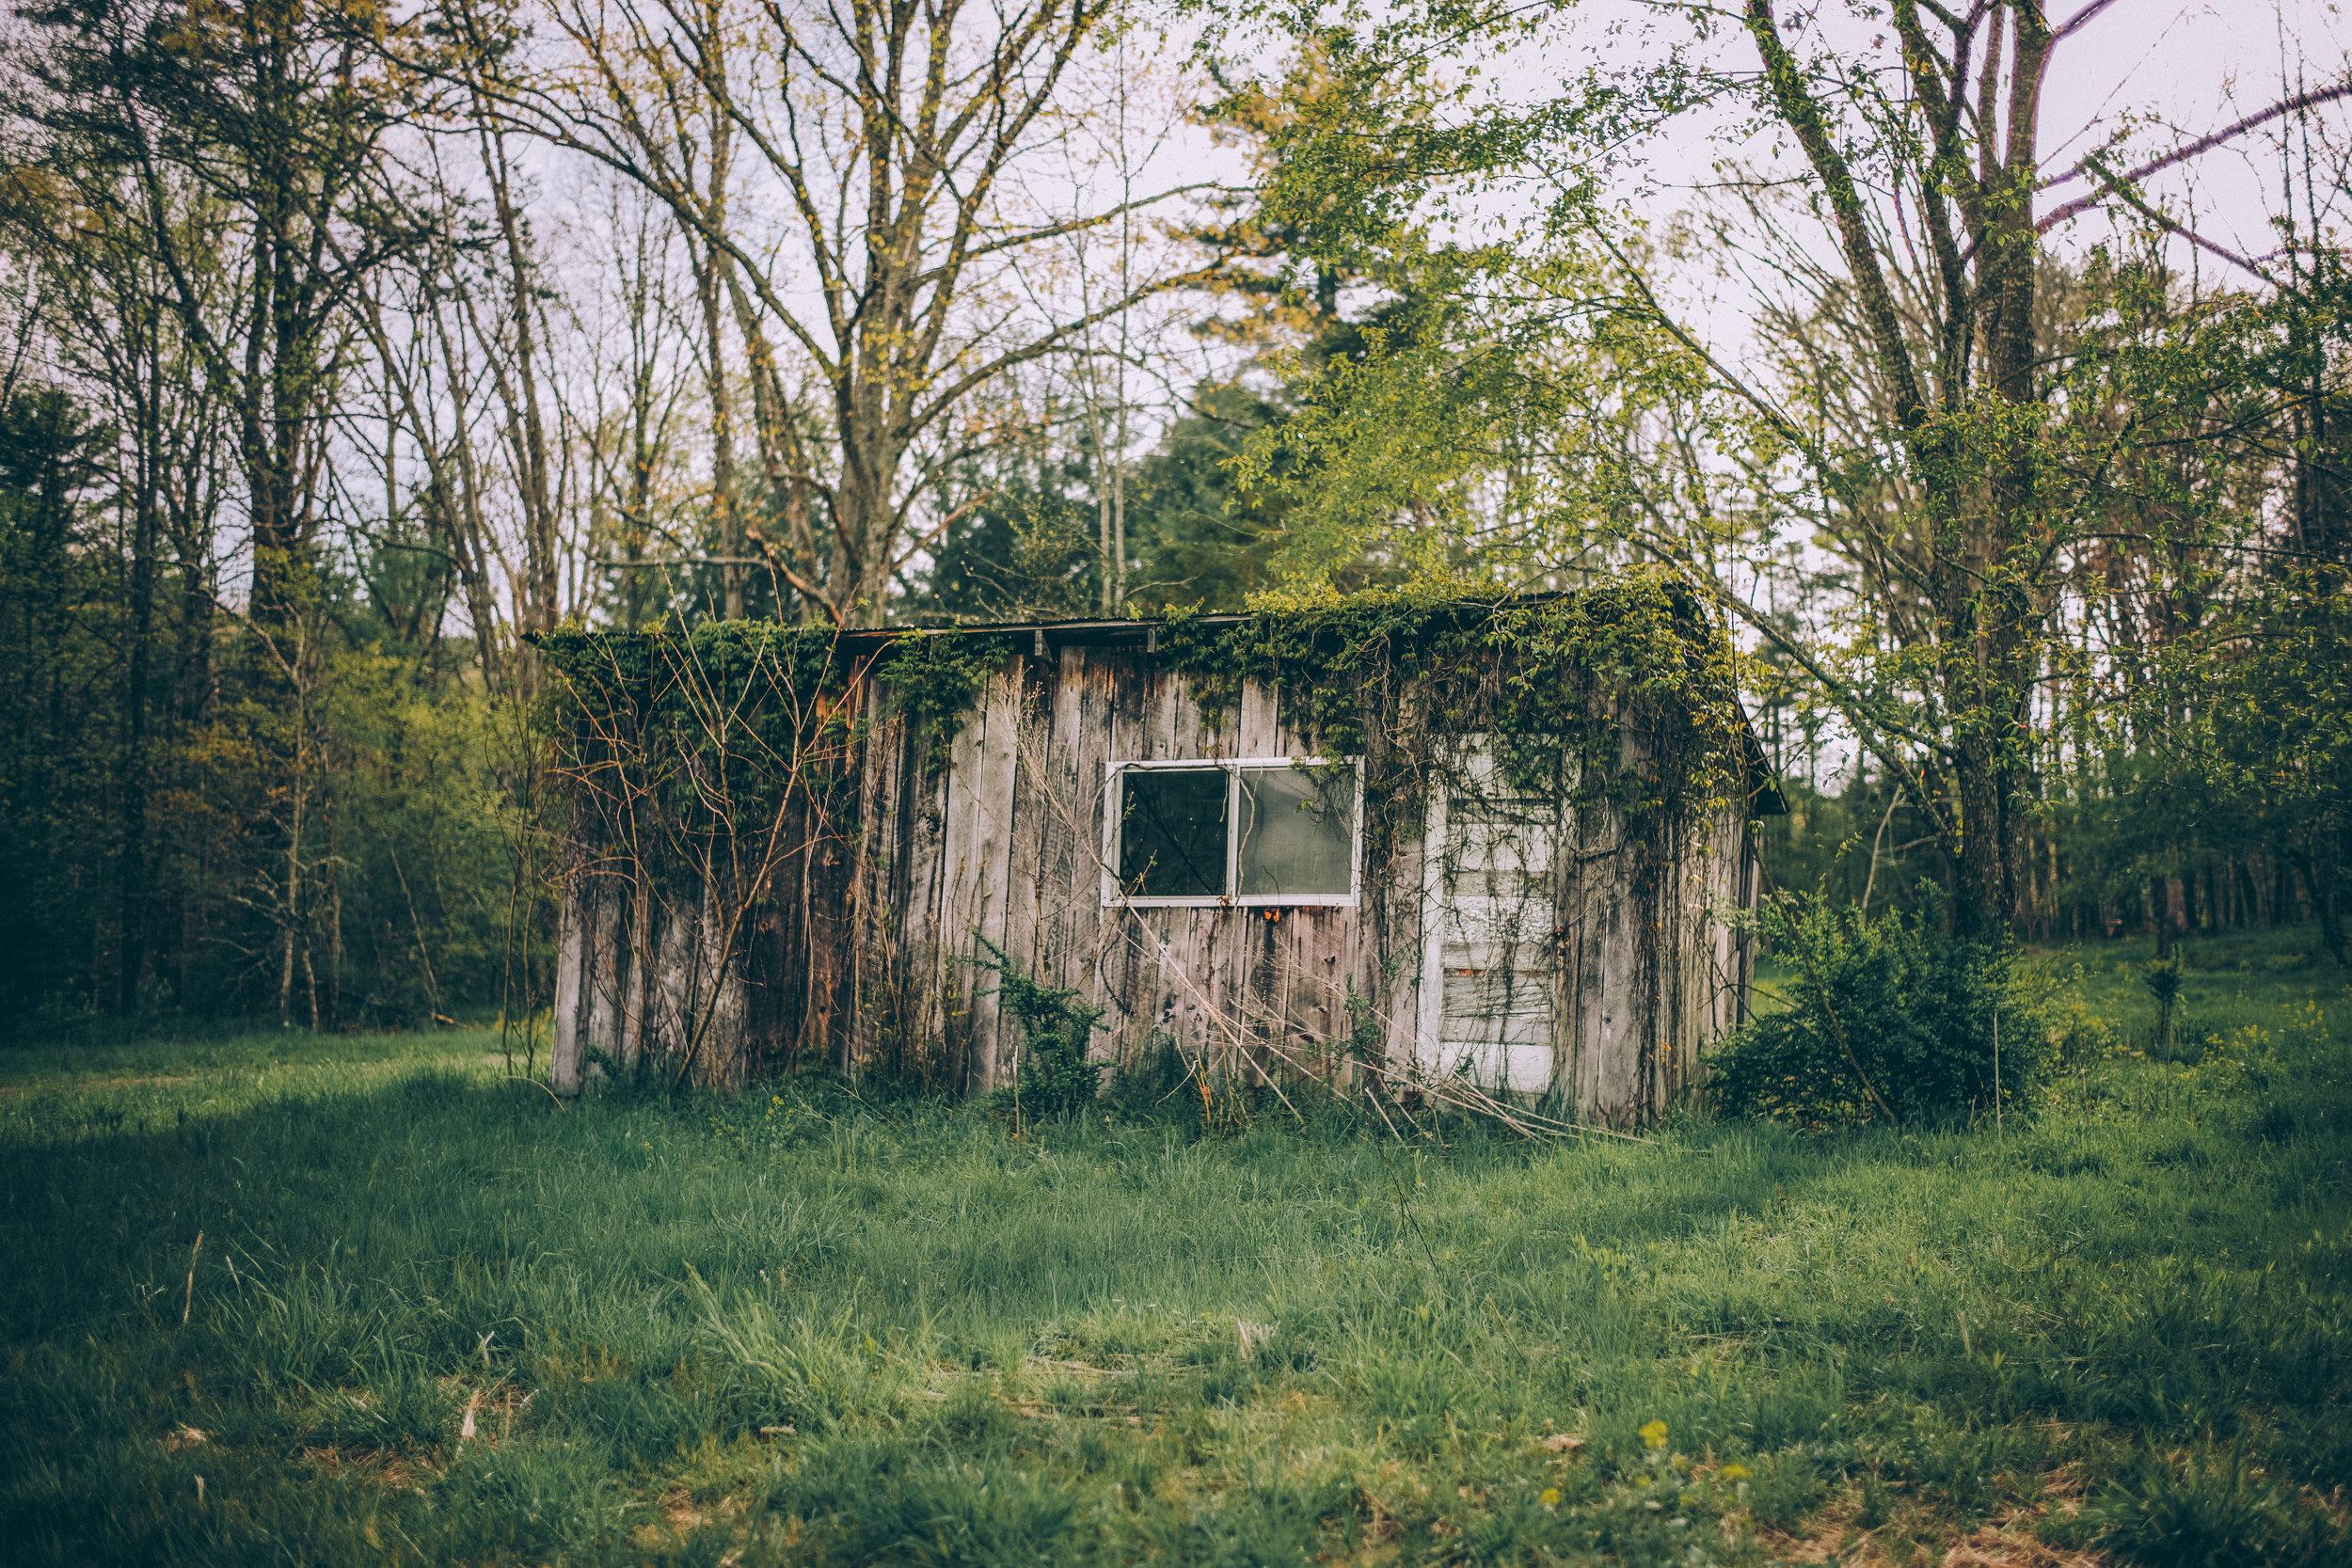 kw-abandoned-va-2019-img7.jpg